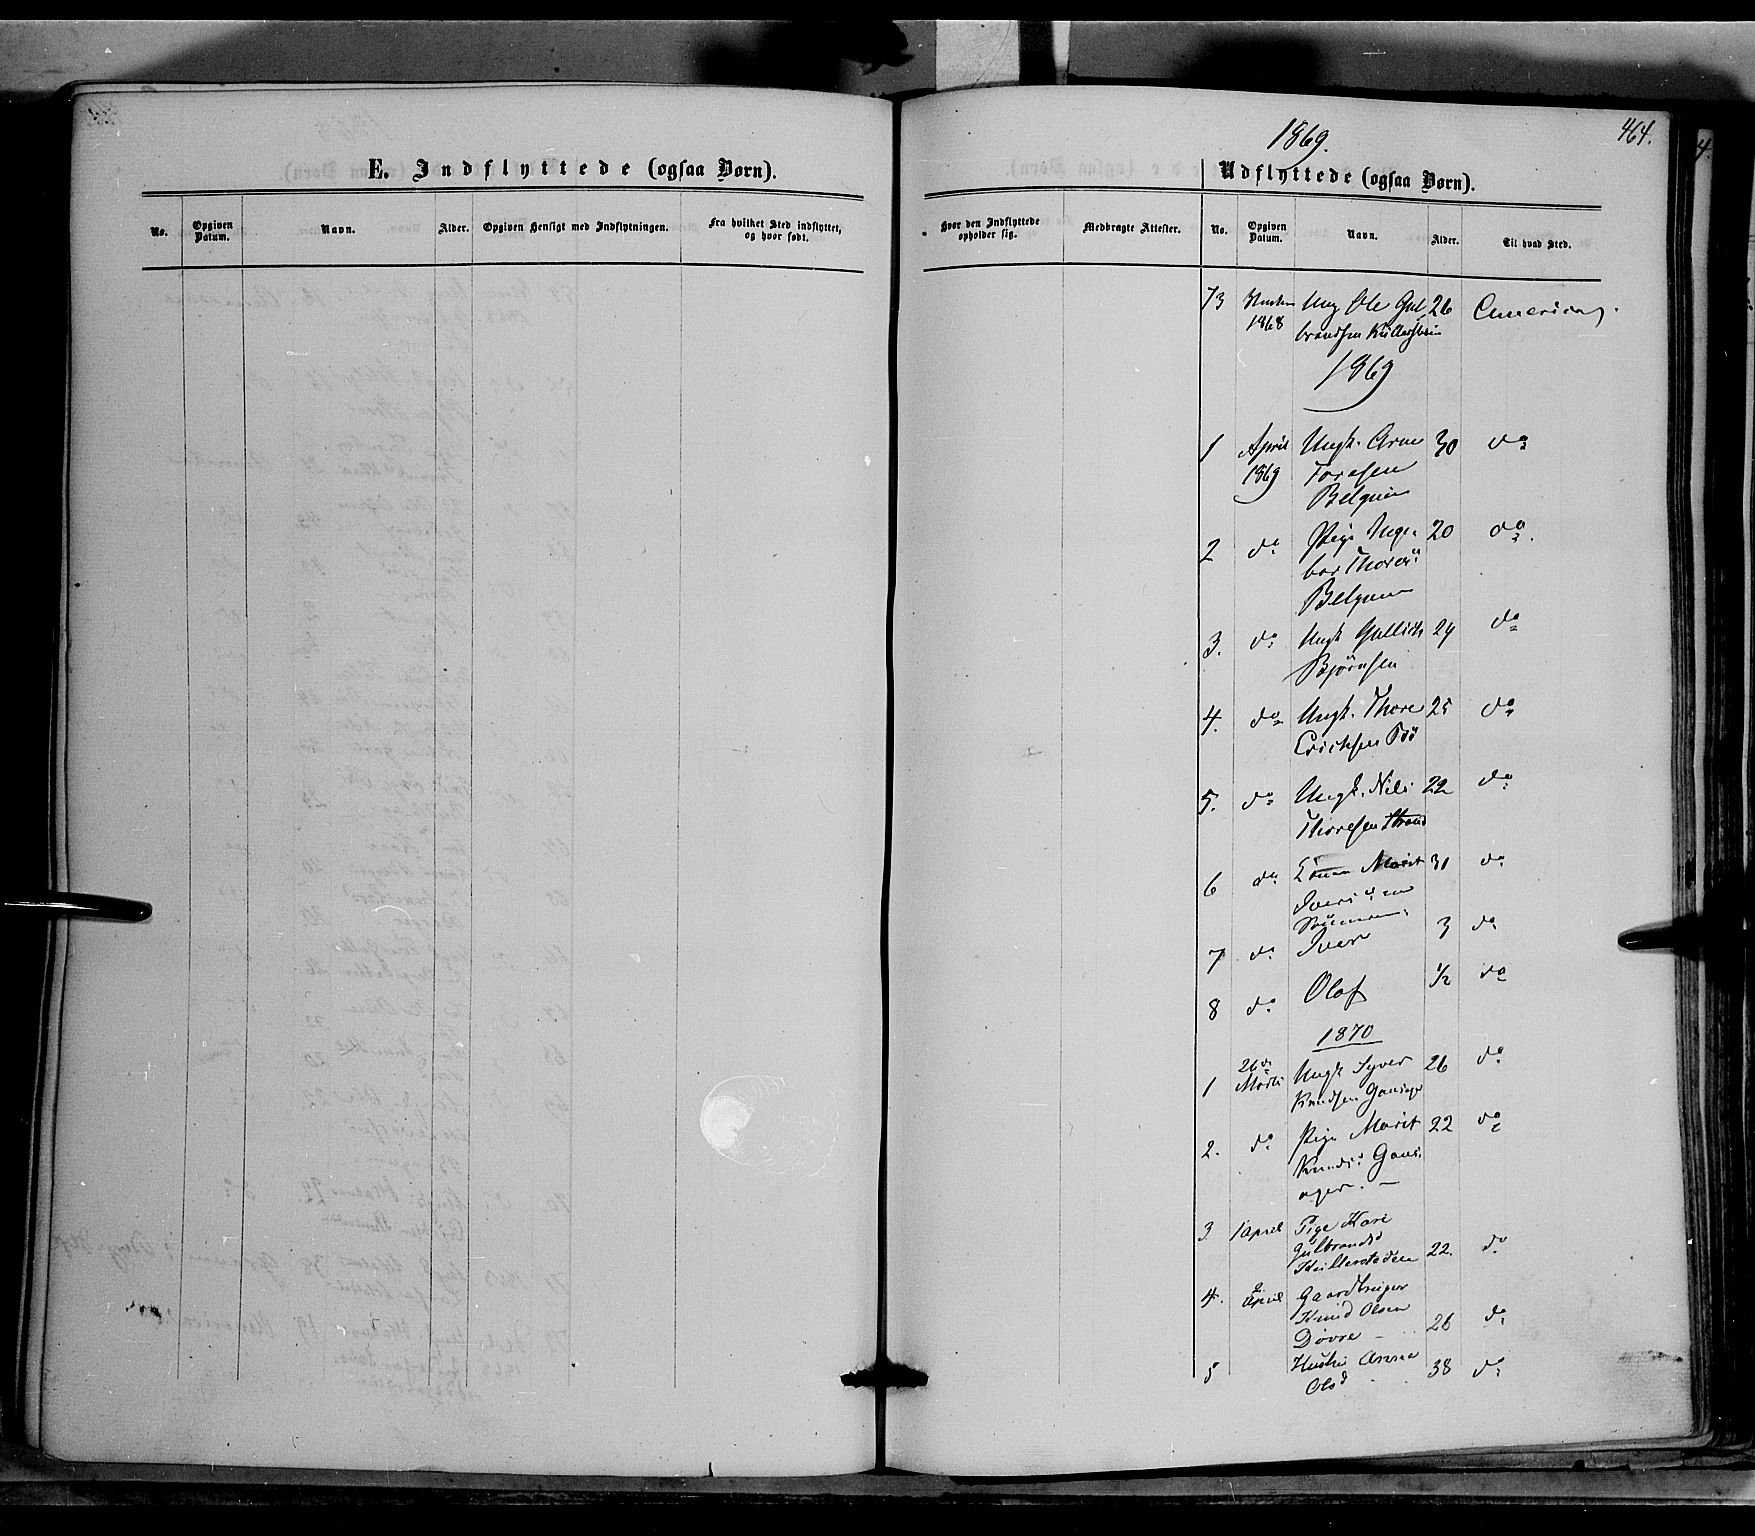 SAH, Nord-Aurdal prestekontor, Ministerialbok nr. 8, 1863-1875, s. 464